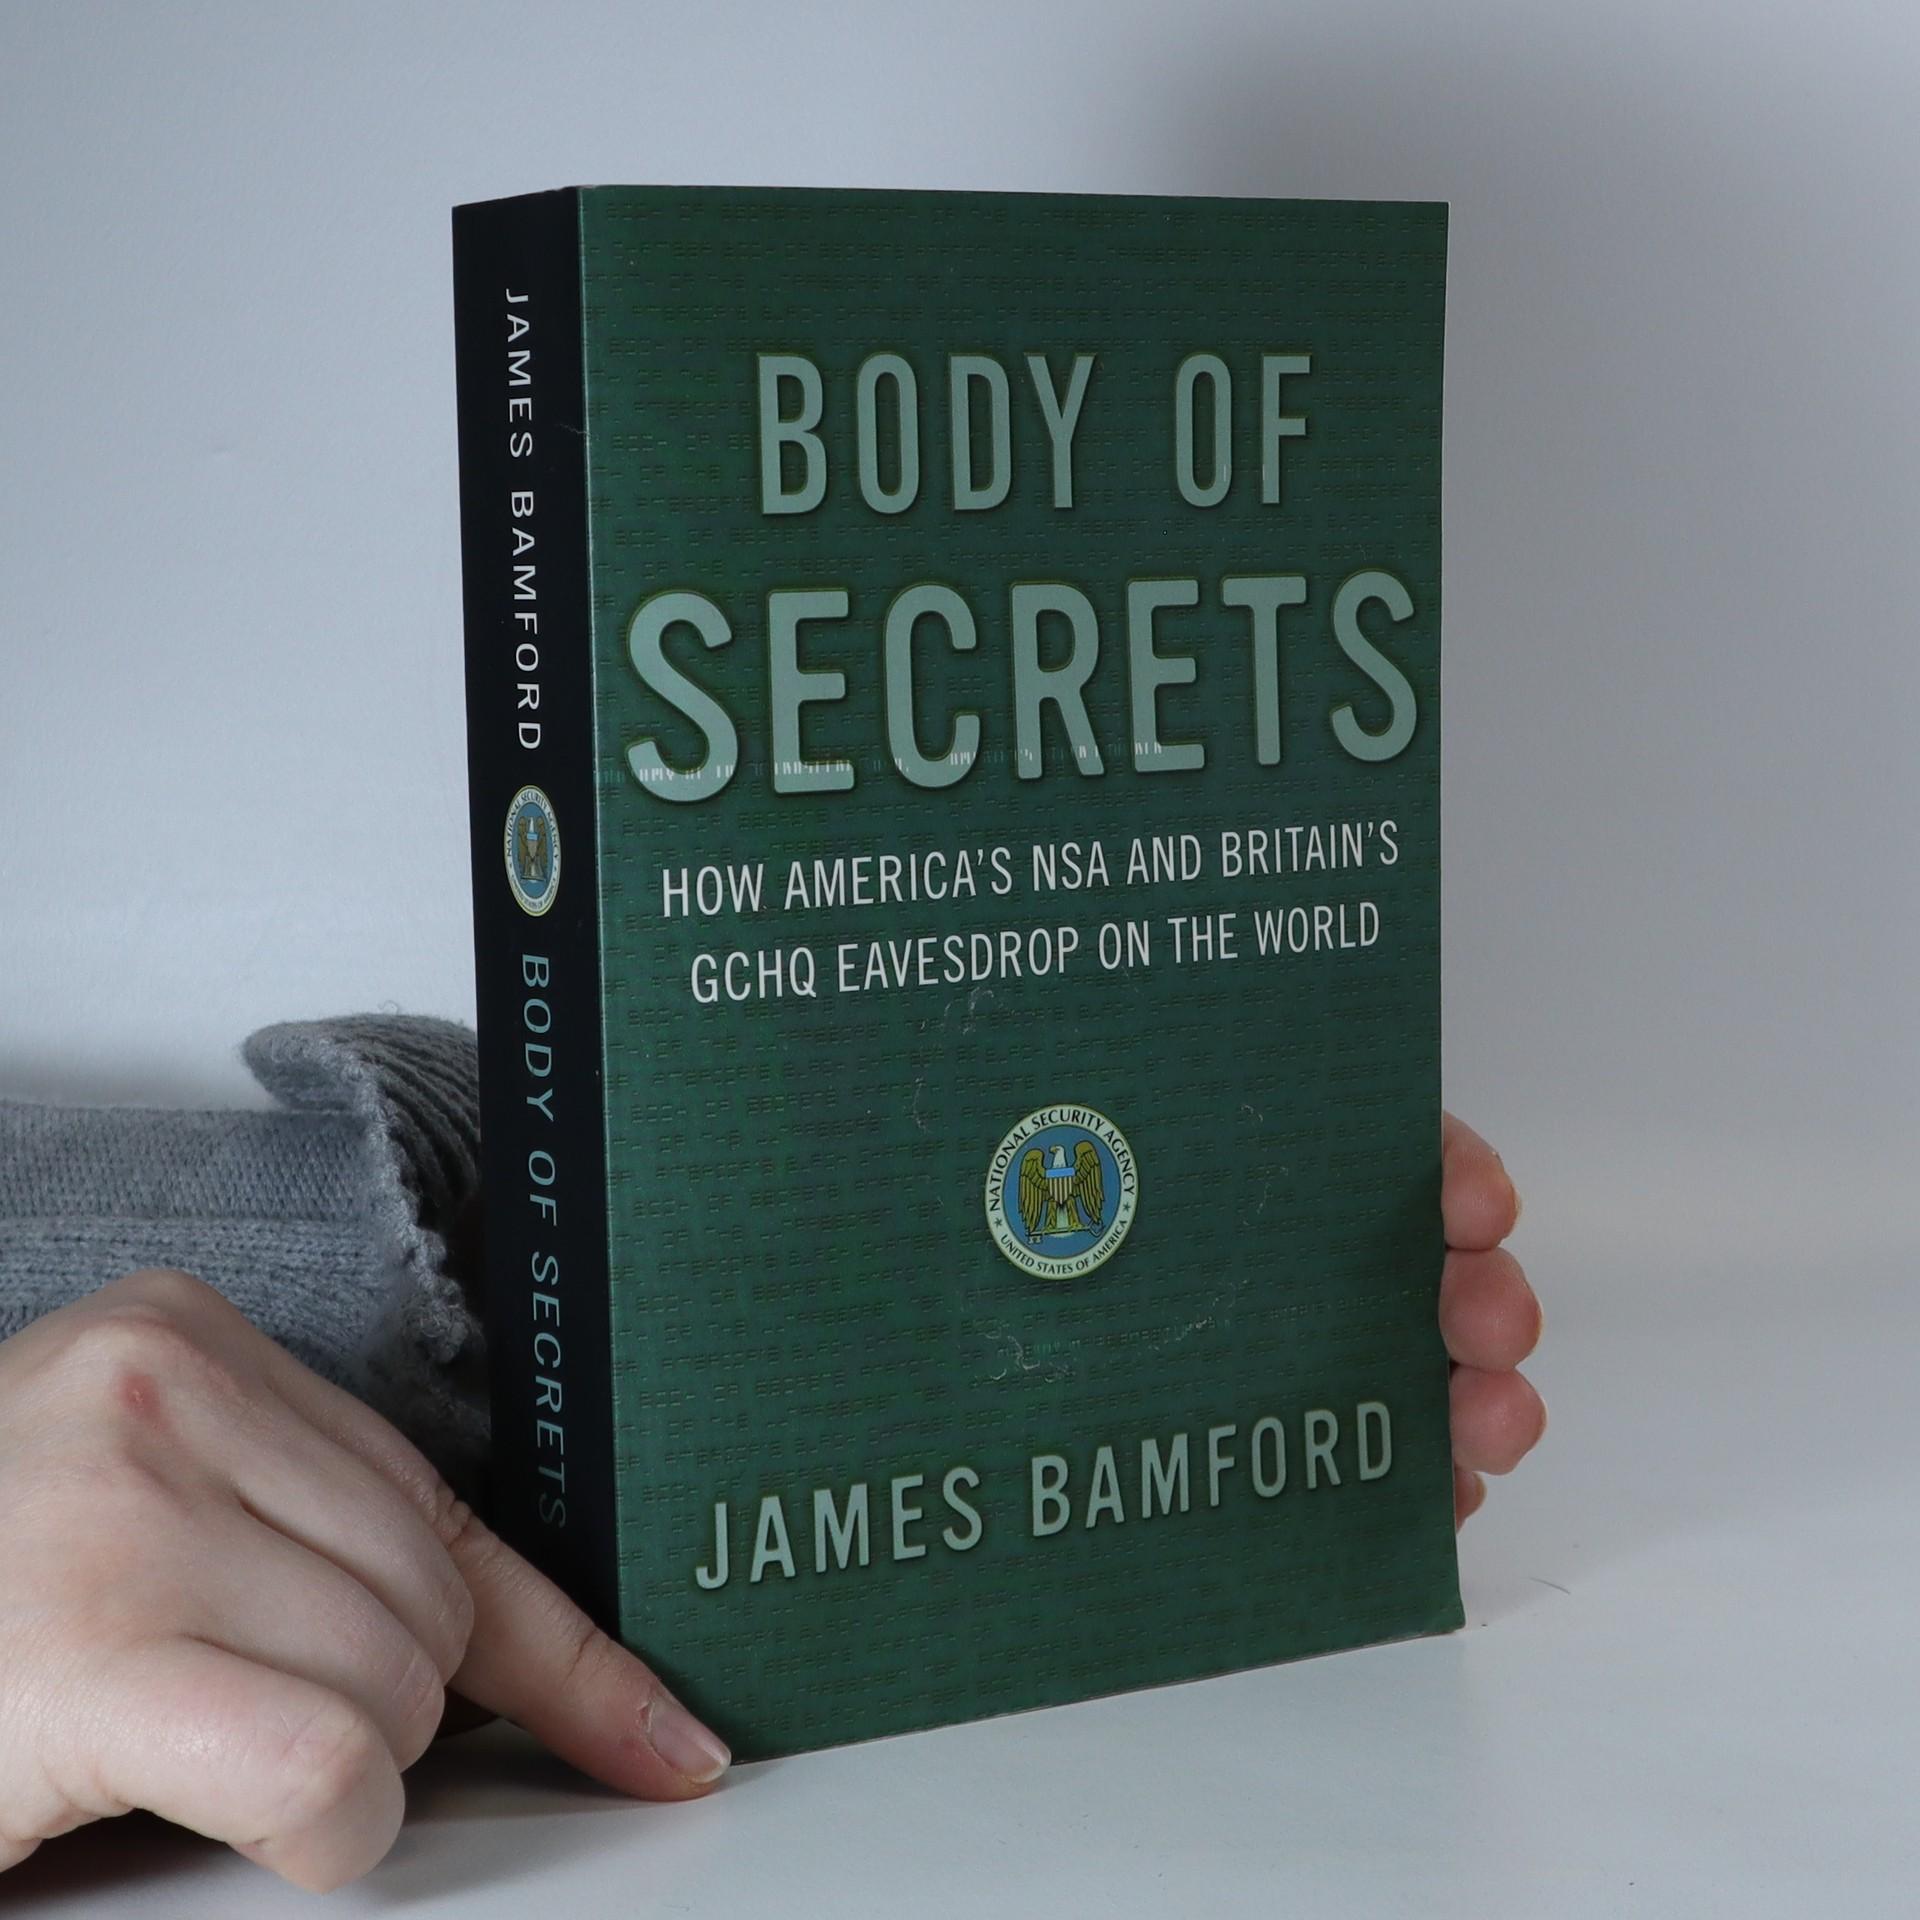 antikvární kniha Body of secrets : how America's NSA and Britain's GCHQ eavesdrop on the world, 2002